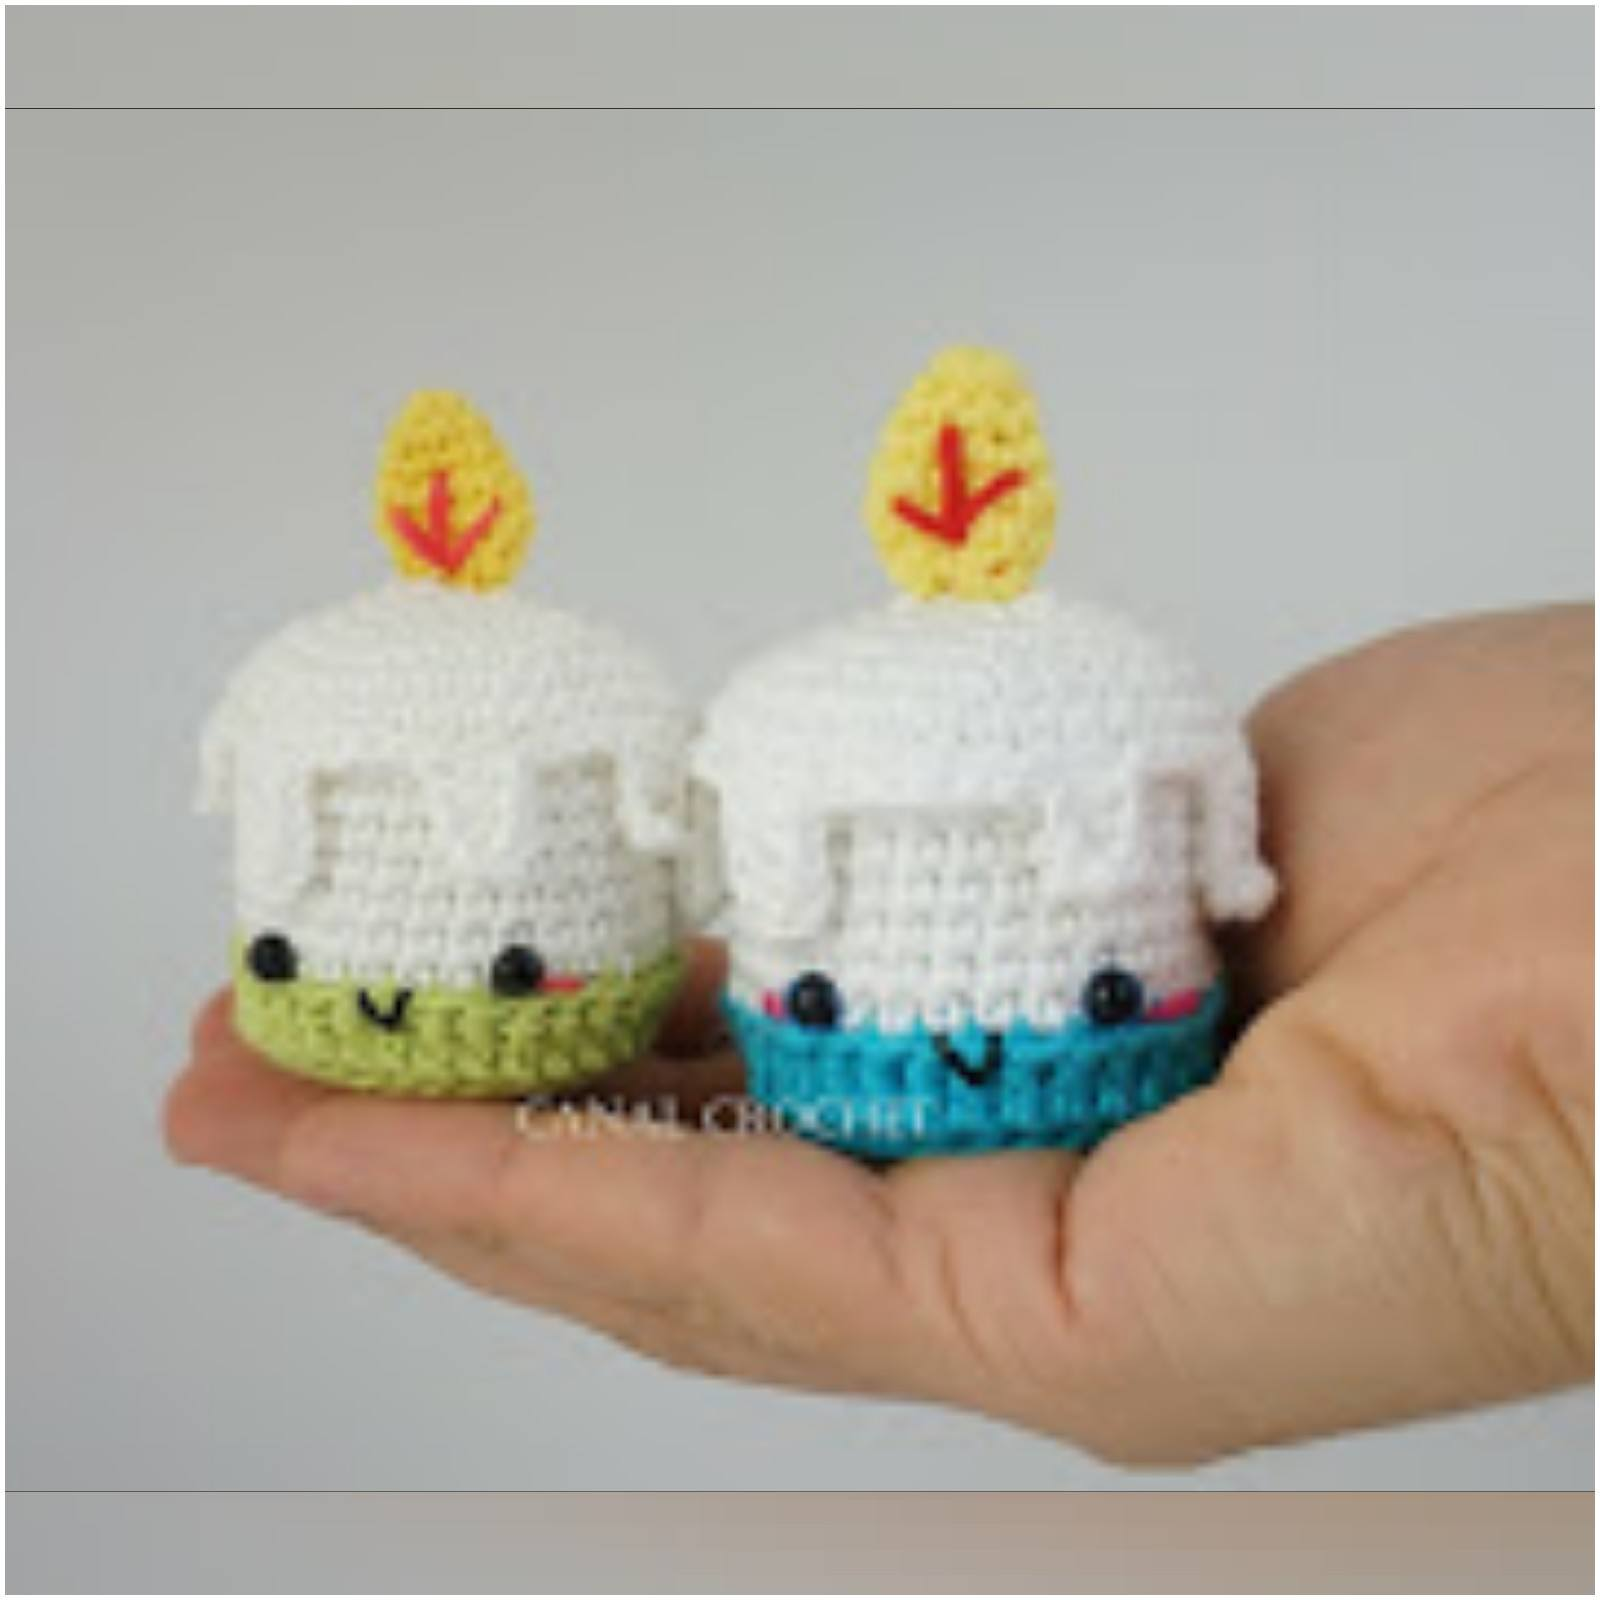 Amigurumislandia: canal crochet